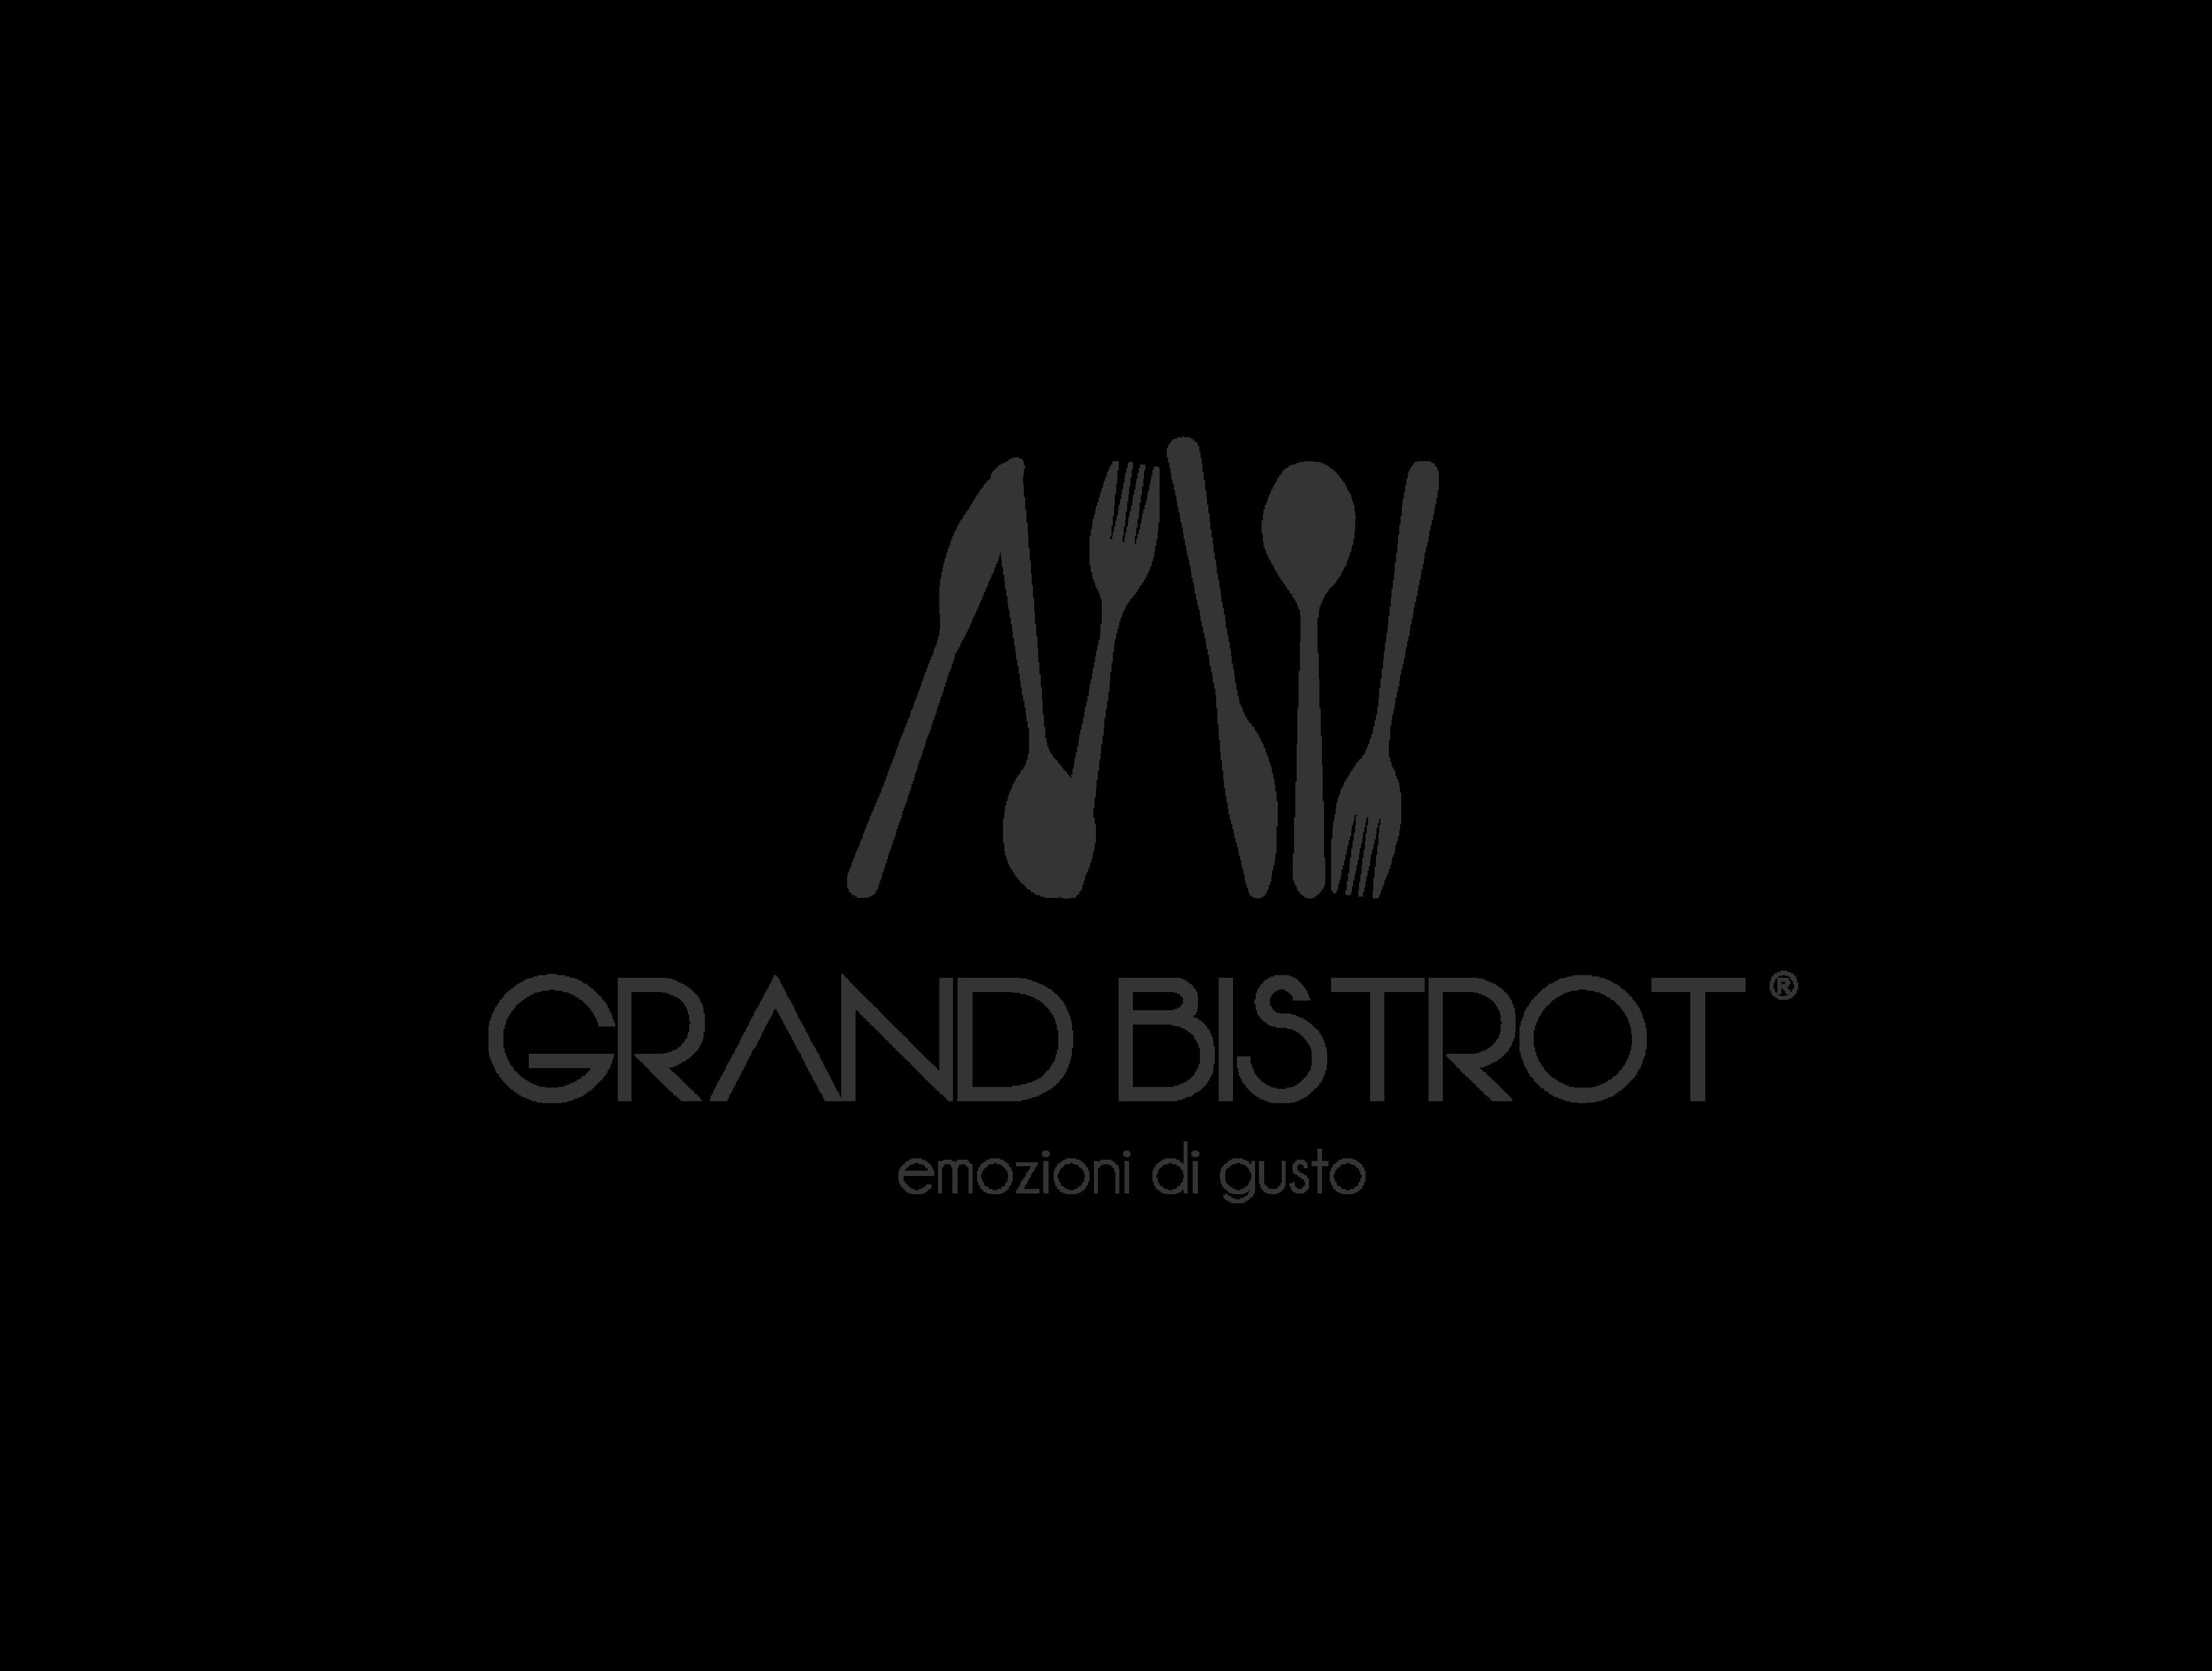 logo grand bistrot